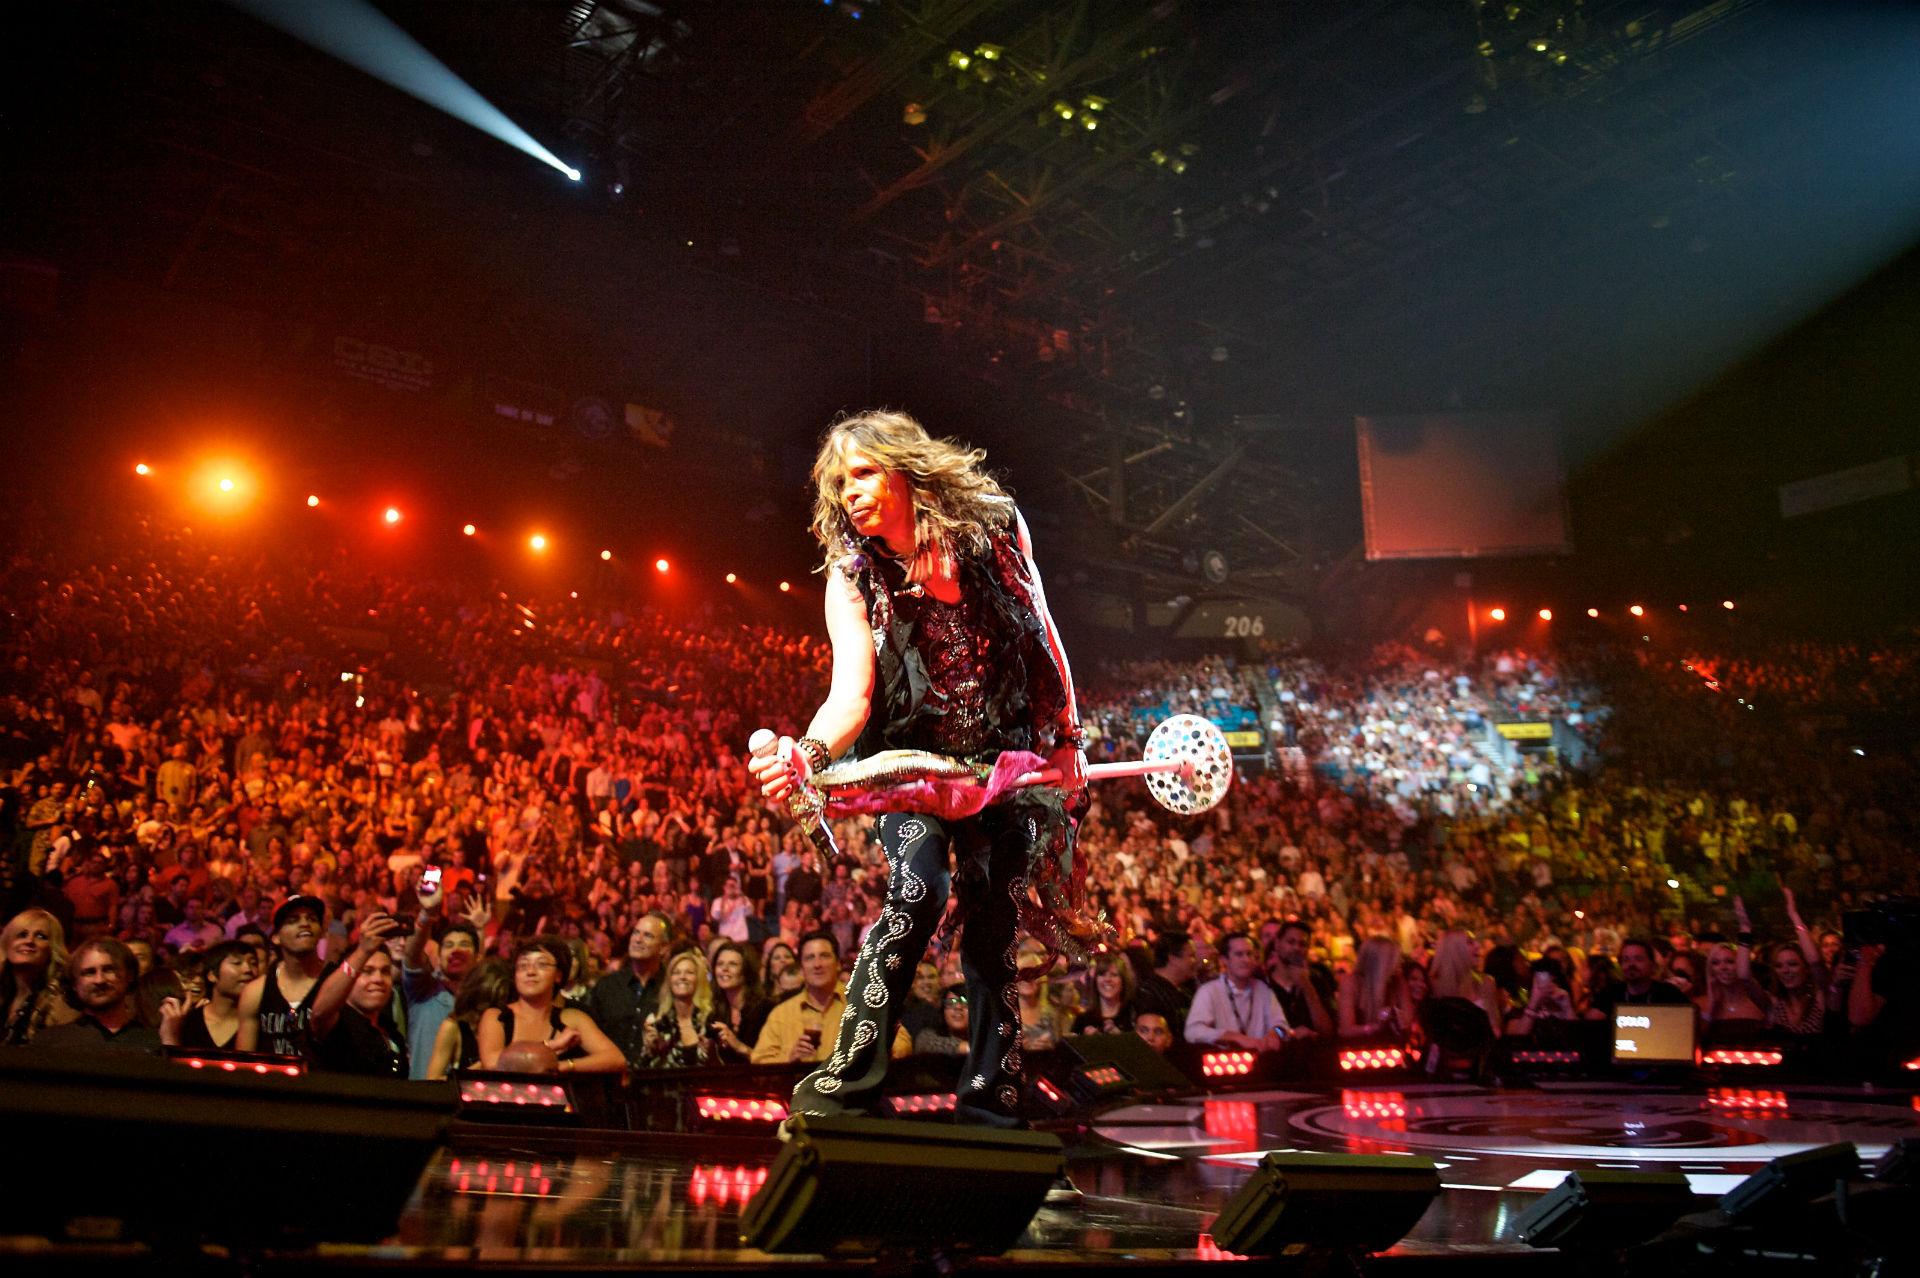 aerosmith steven tyler hard rock concert crowd stage light